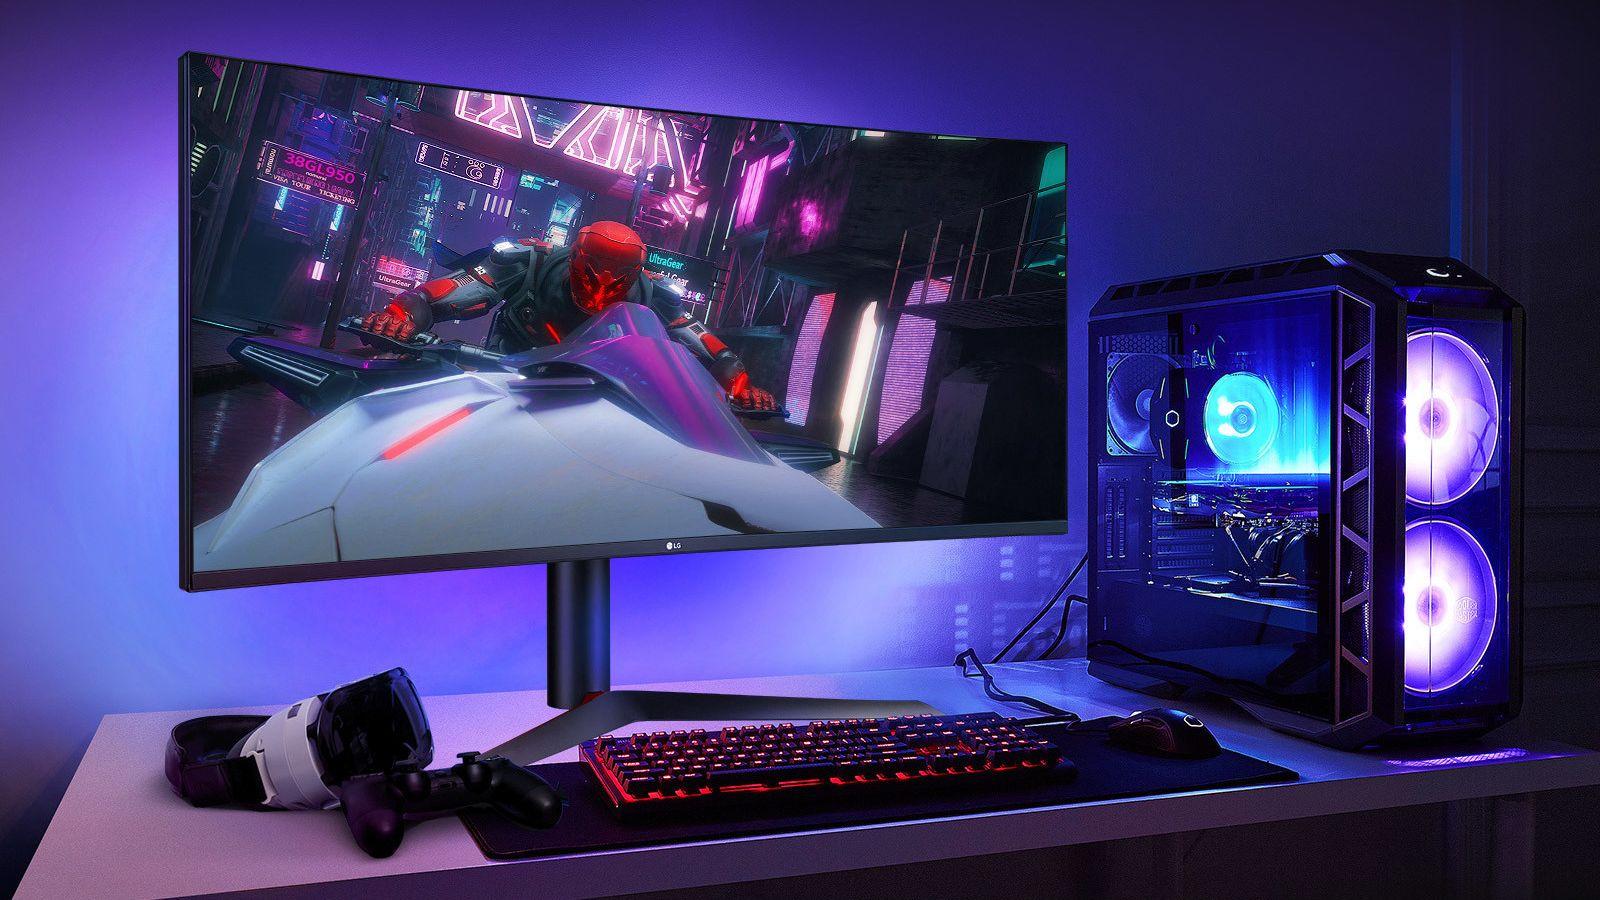 LGs nye 37,5-tommer er en heftig gamingskjerm med ditto pris